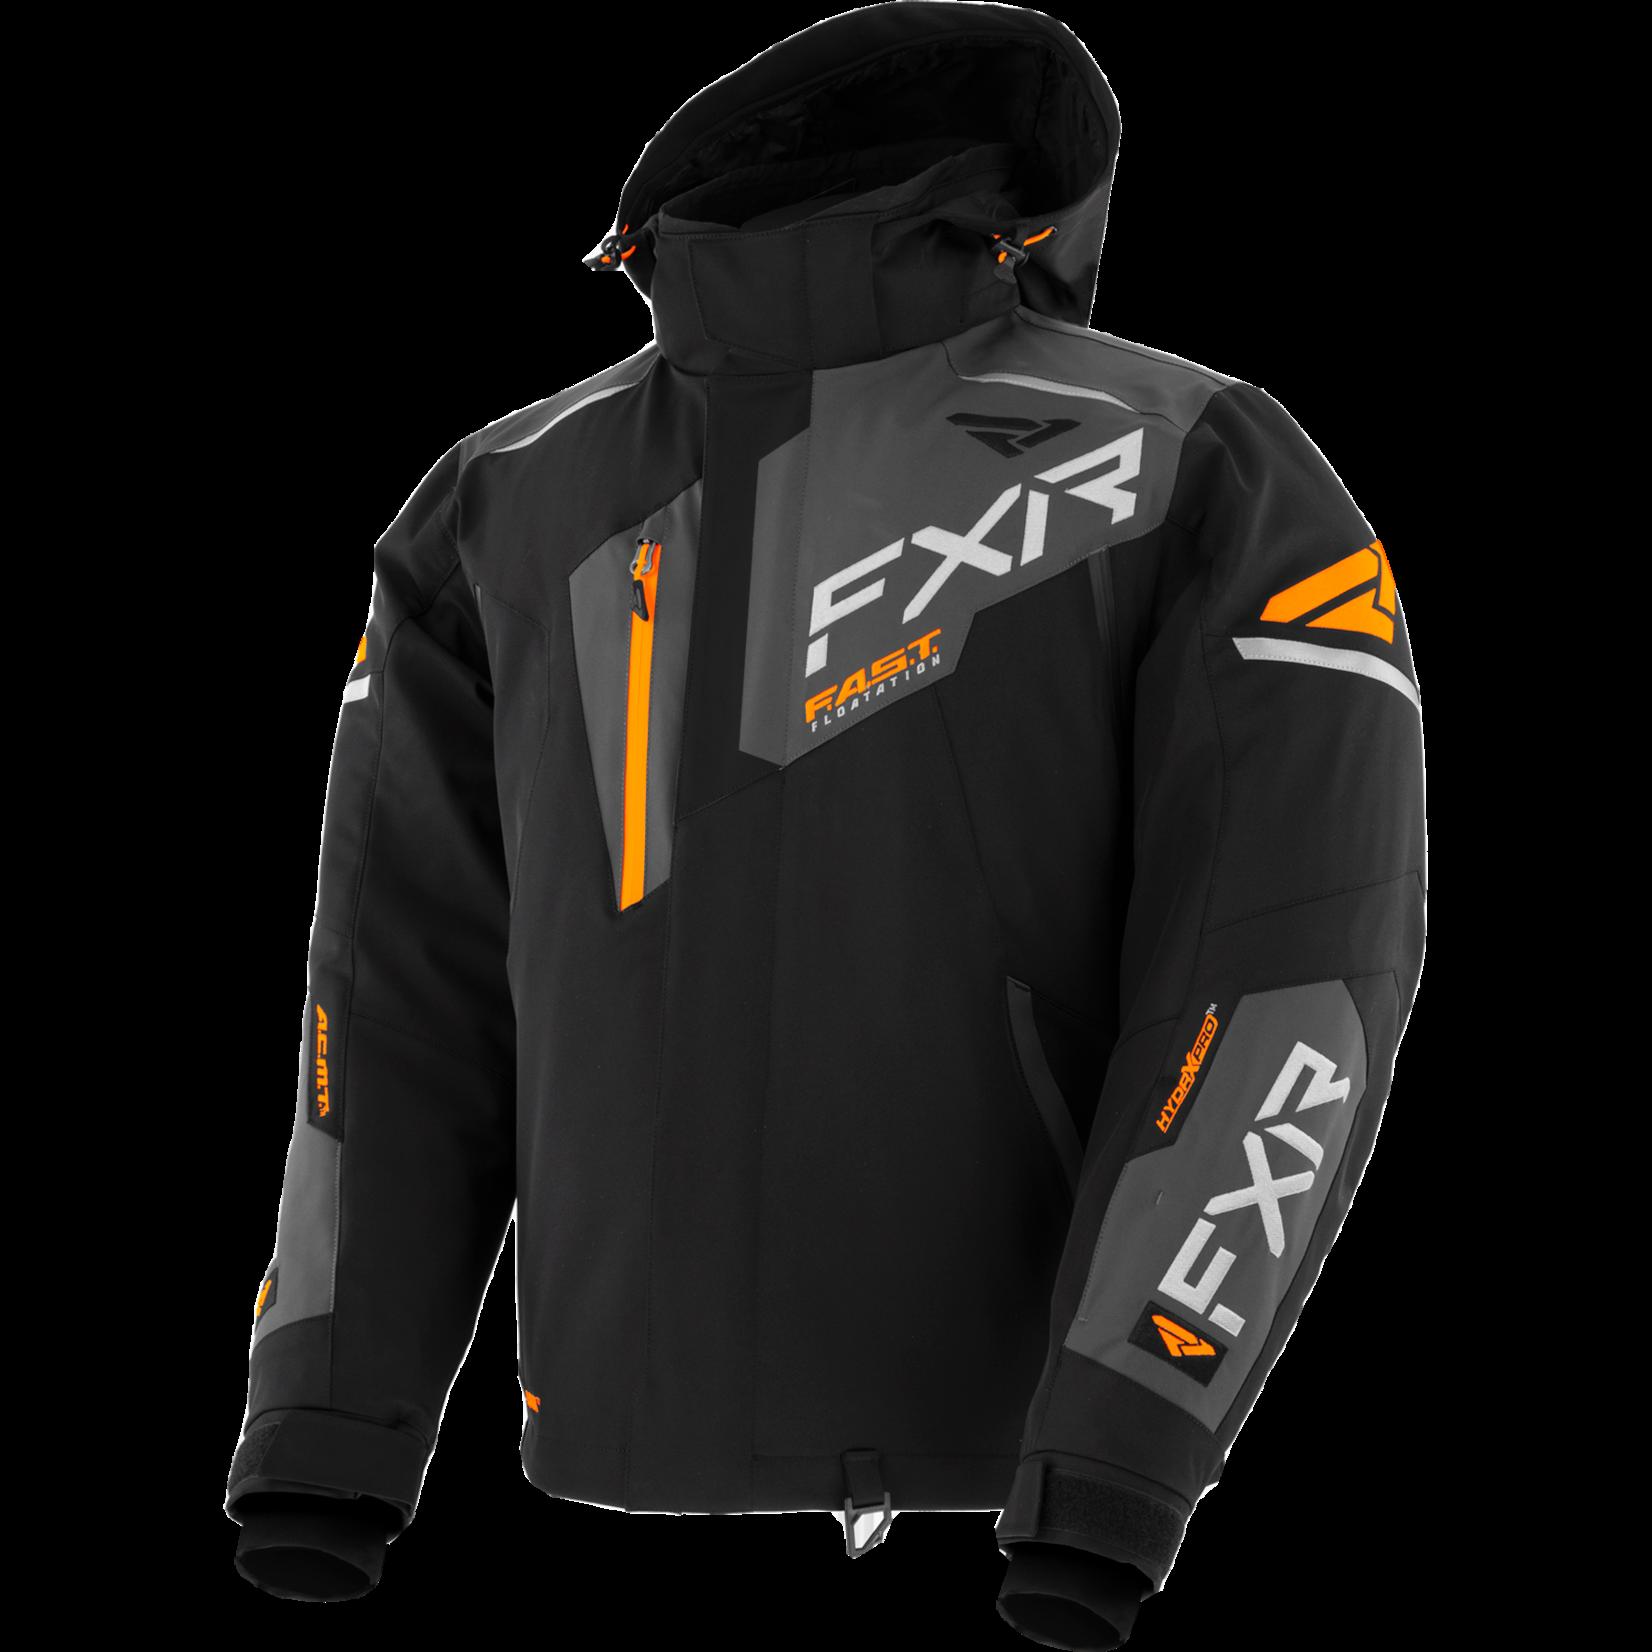 FXR FXR Men's Renegade FX Jacket